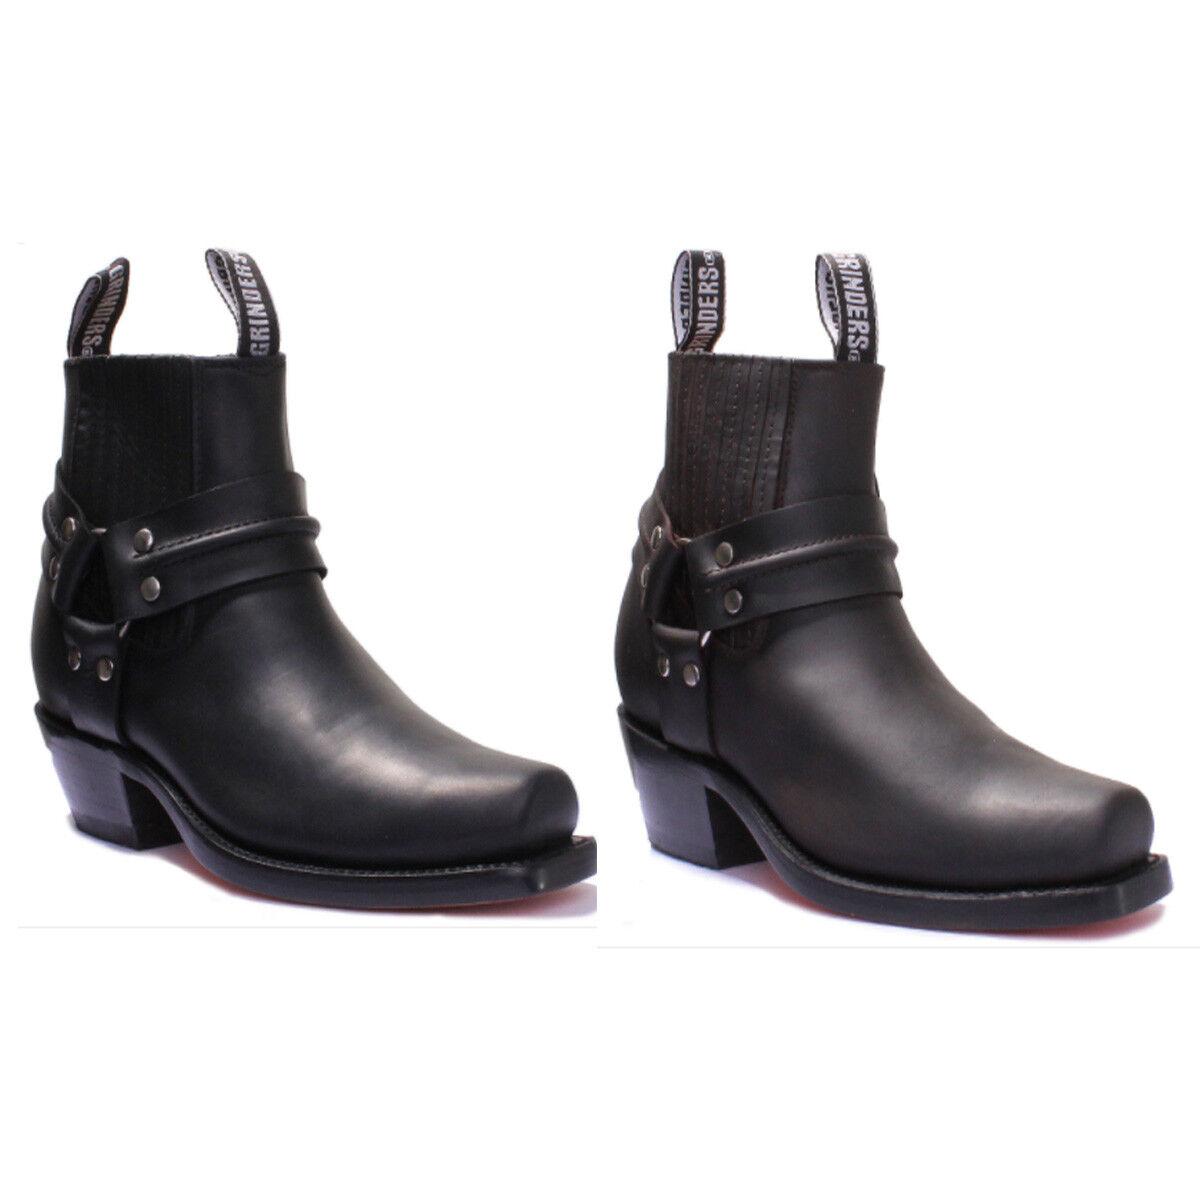 Grinders Harness Lo Unisex Leather Cowboy Biker Ankle Stiefel UK Größe 3 - 12